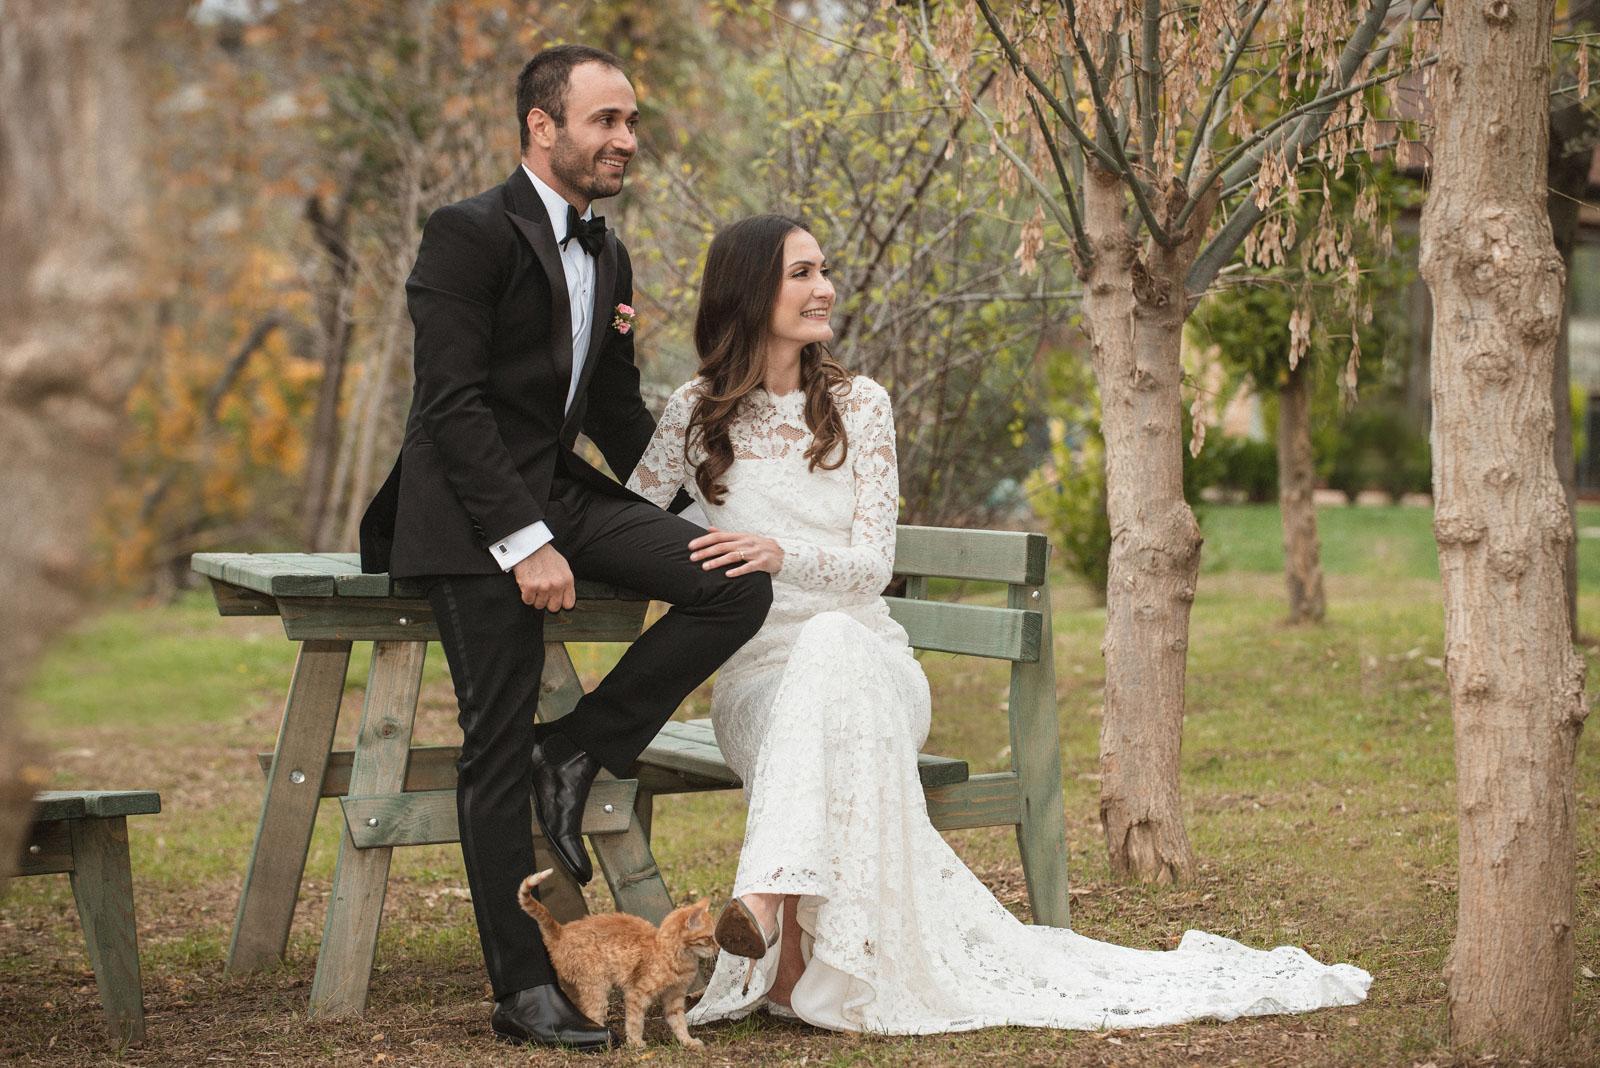 Işık & Ismail Wedding Photo Shoot. Umur Dilek Wedding Photography. Destination Wedding Photographer istanbul based